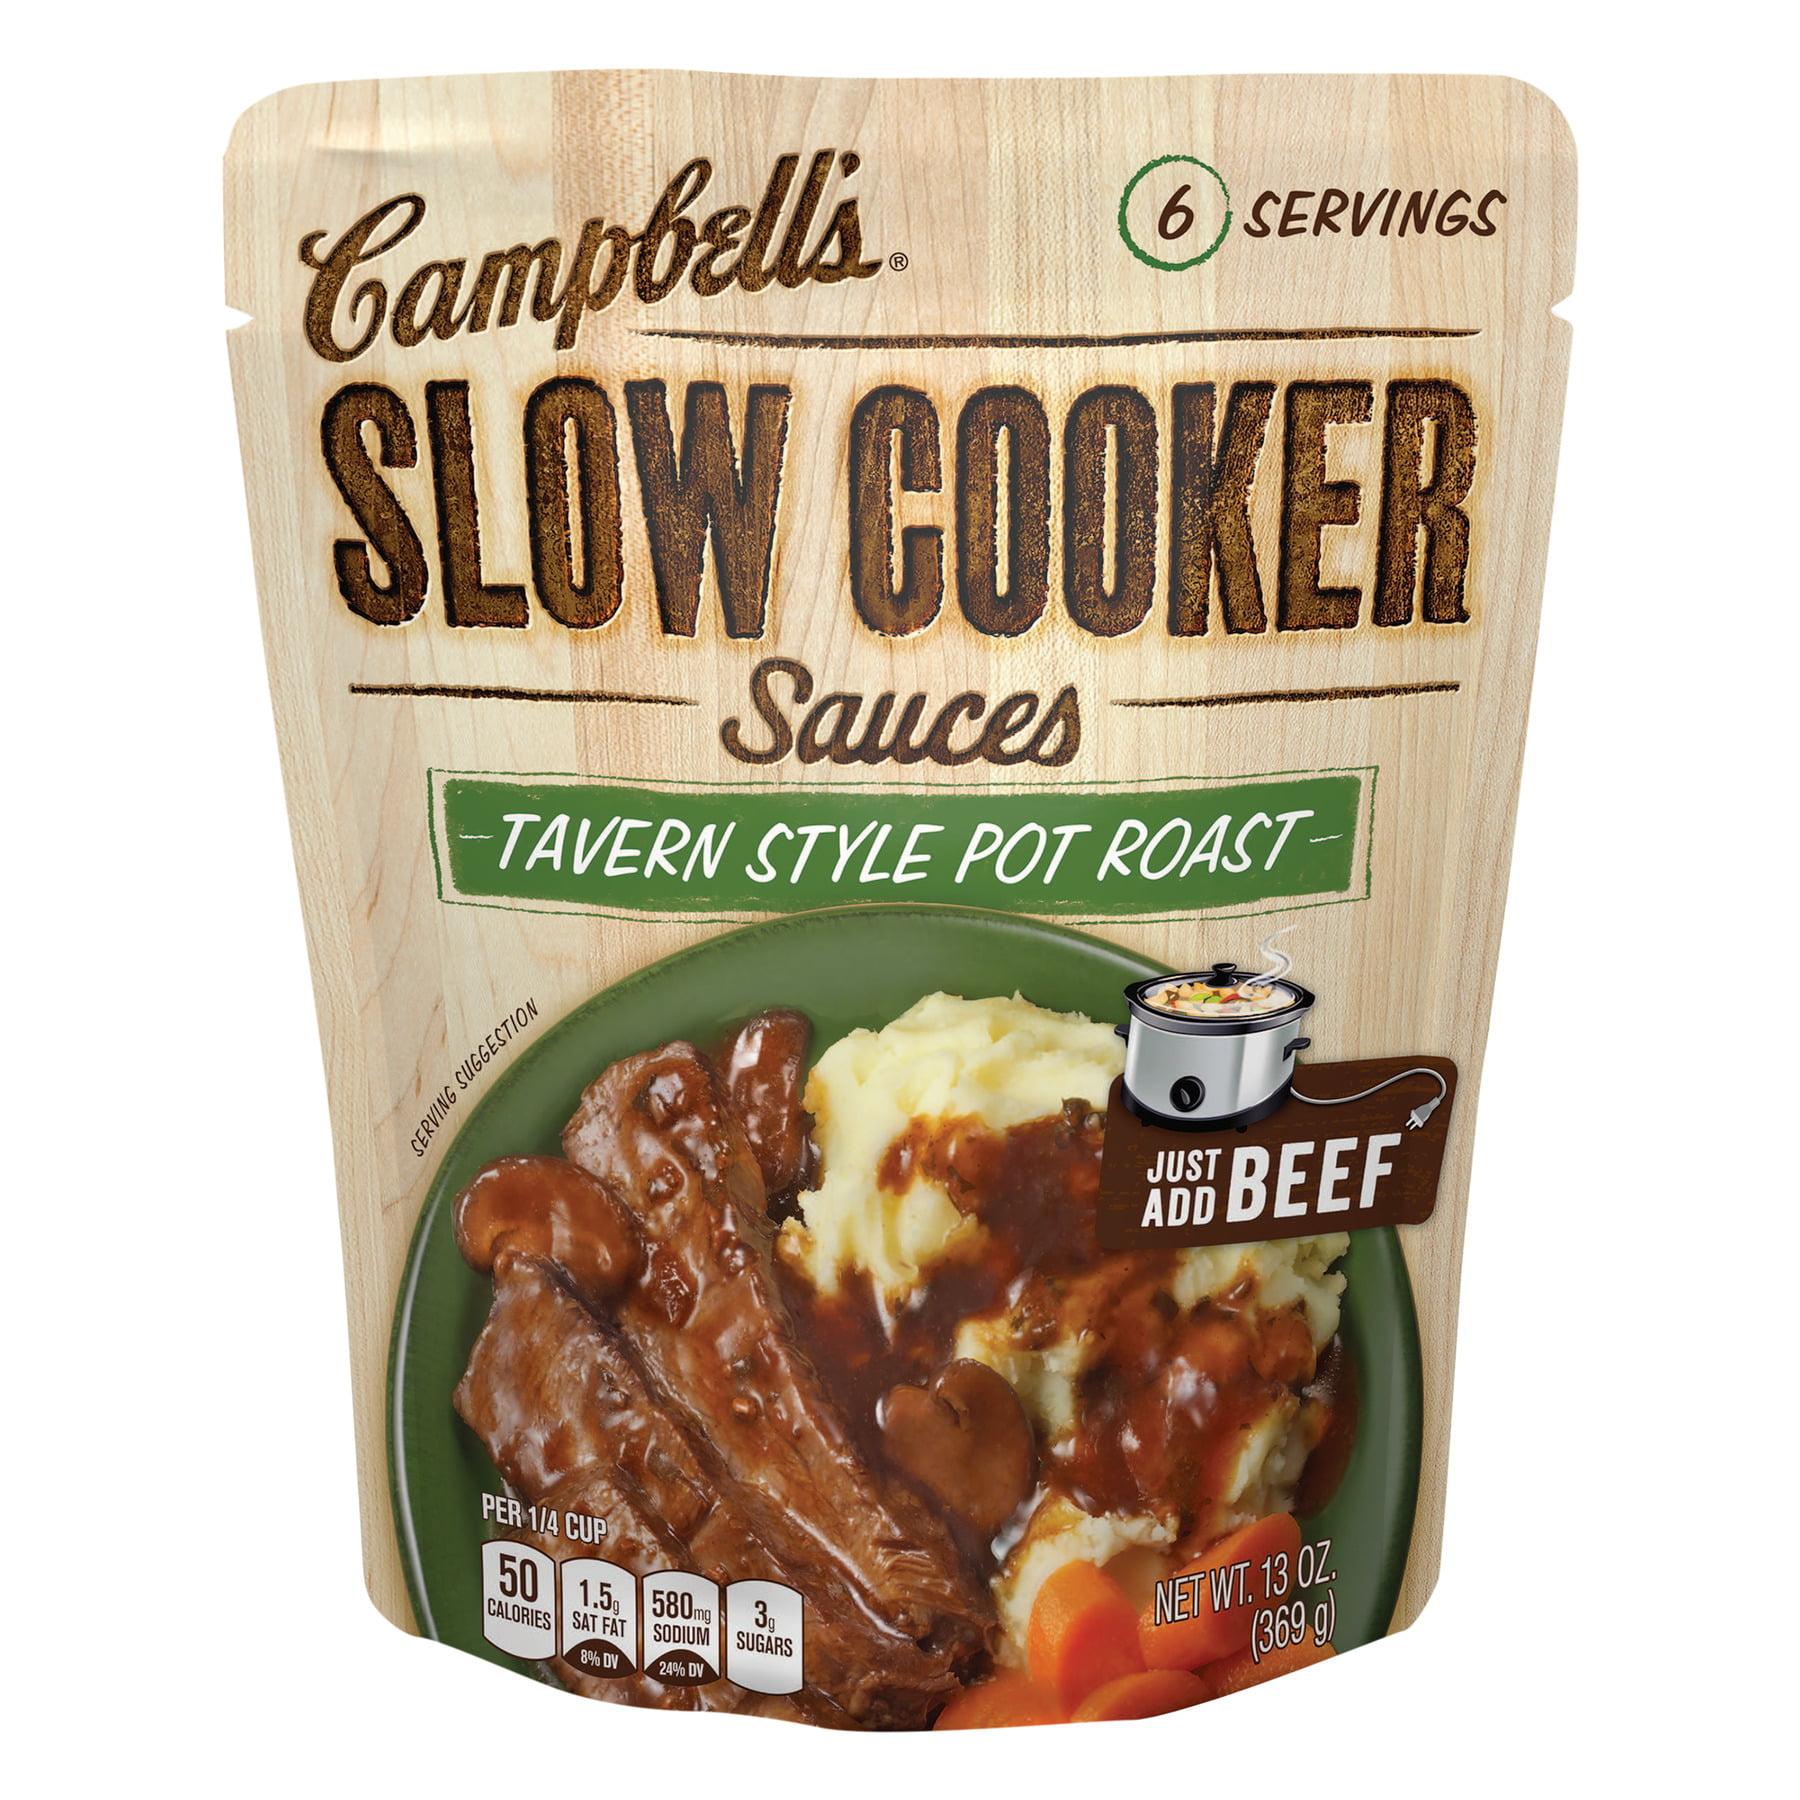 Campbell's® Slow Cooker Sauces Tavern Style Pot Roast, 13 oz., 13.0 OZ